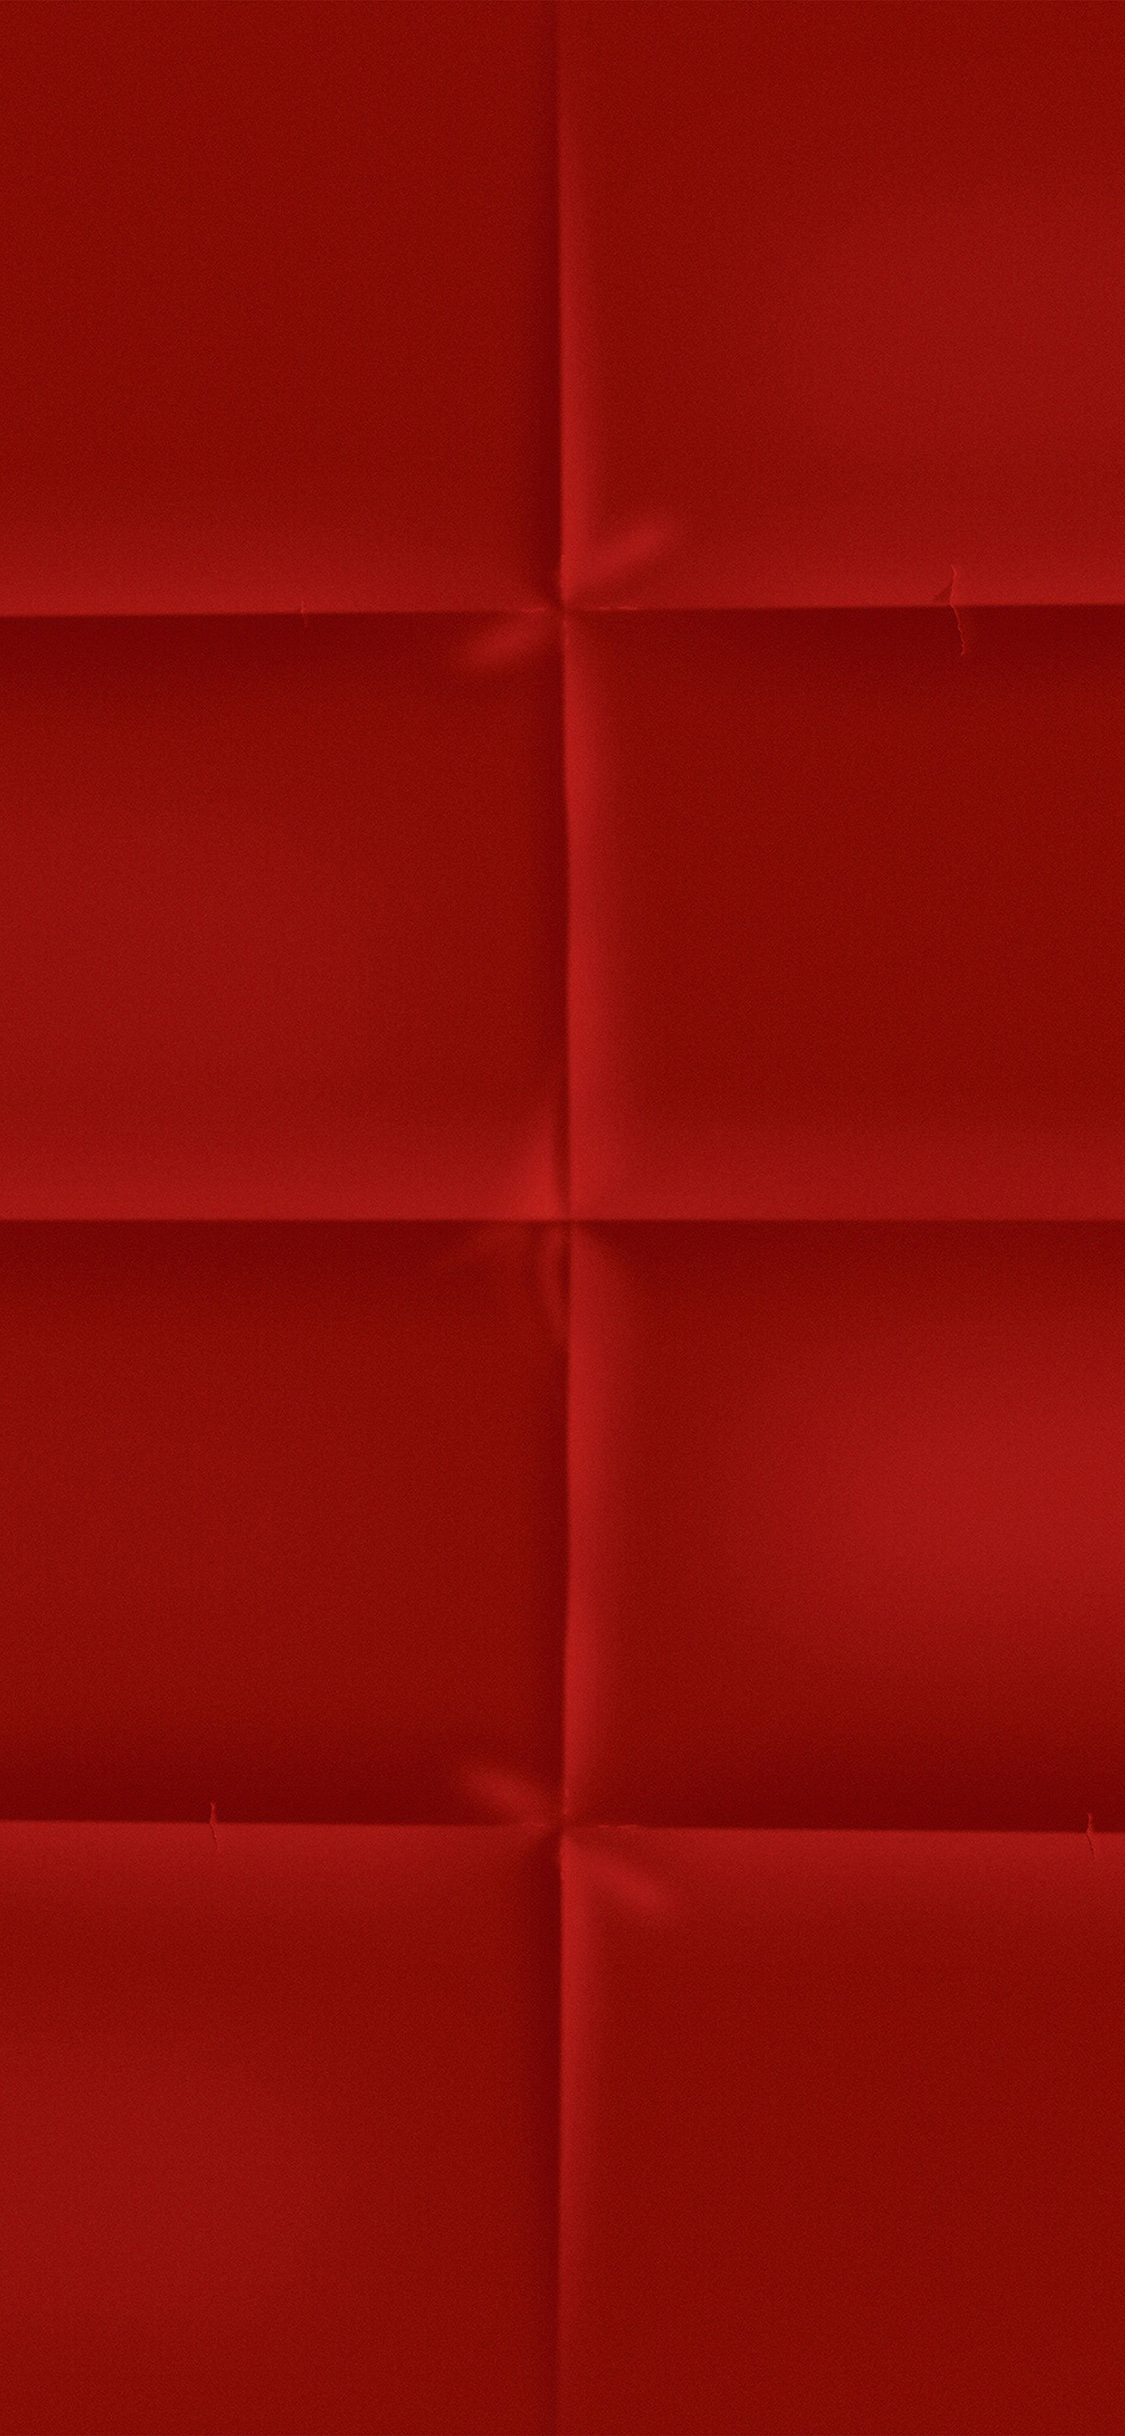 iPhoneXpapers.com-Apple-iPhone-wallpaper-vu09-red-texture-paper-pattern